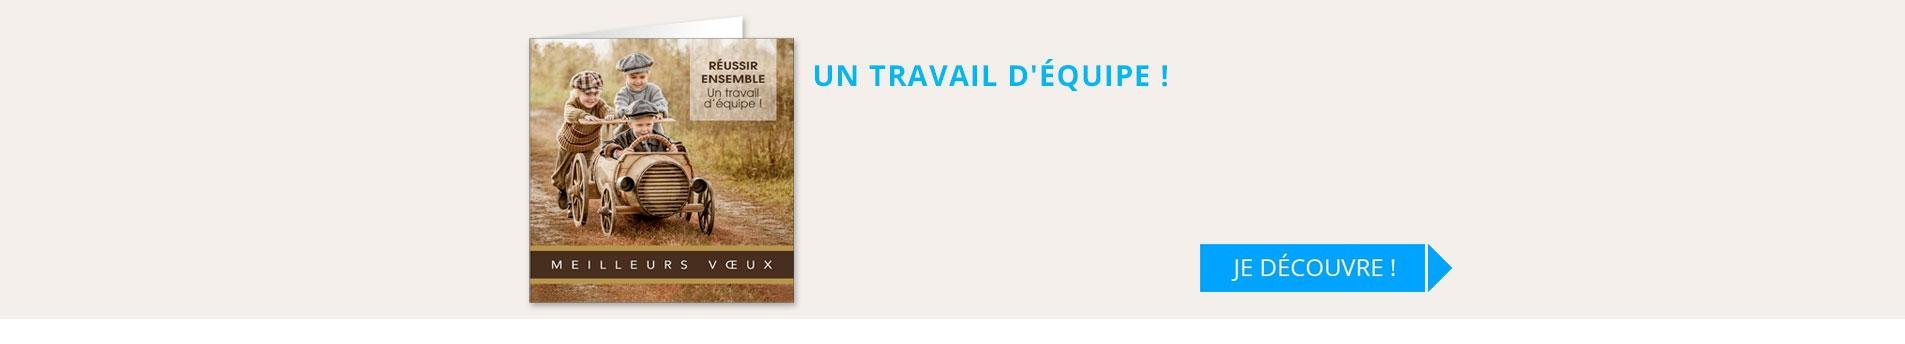 UN TRAVAIL D'ÉQUIPE !